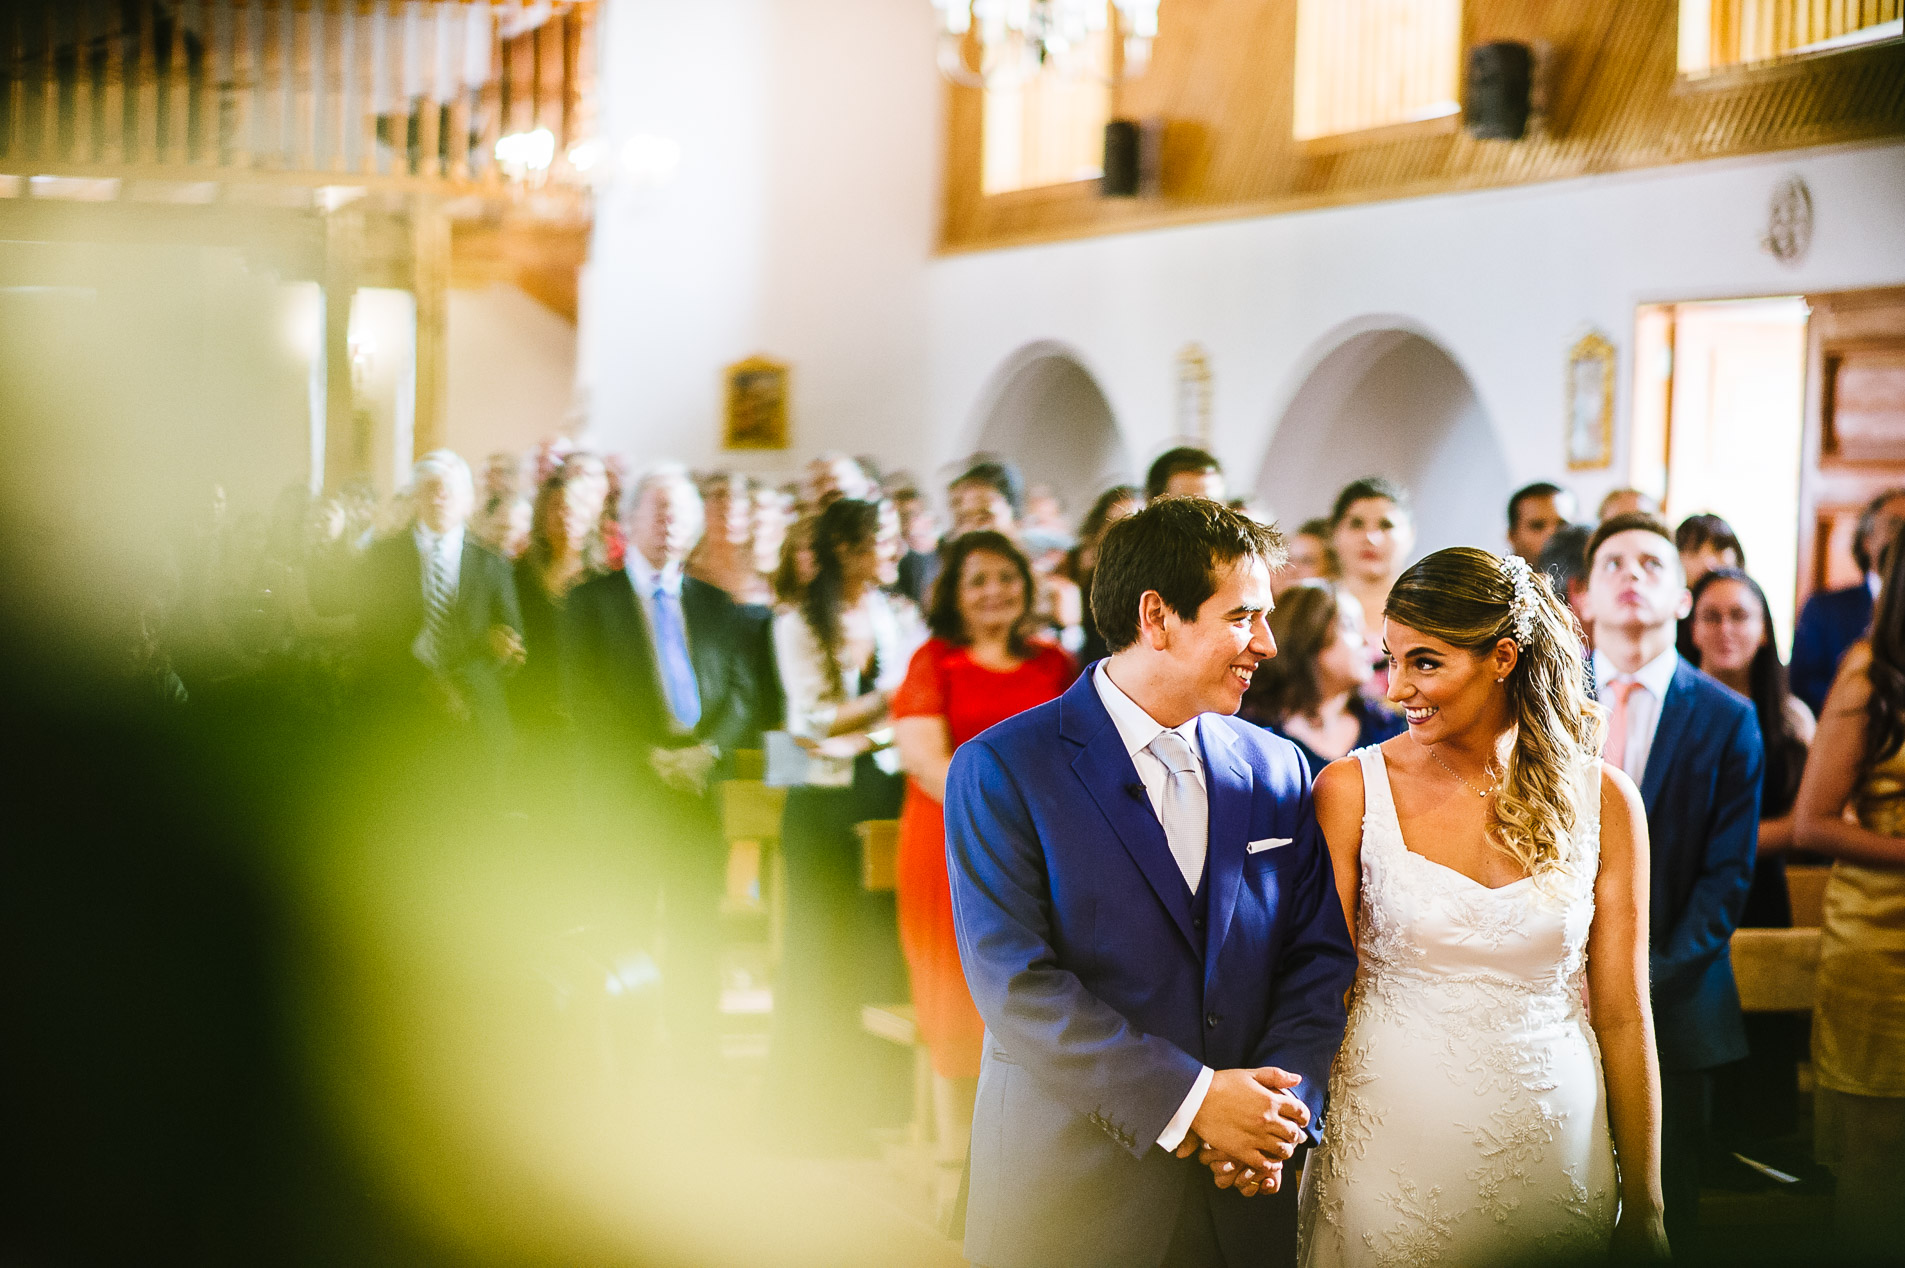 Mariana-Cristian-Fotos-Matrimonio-17